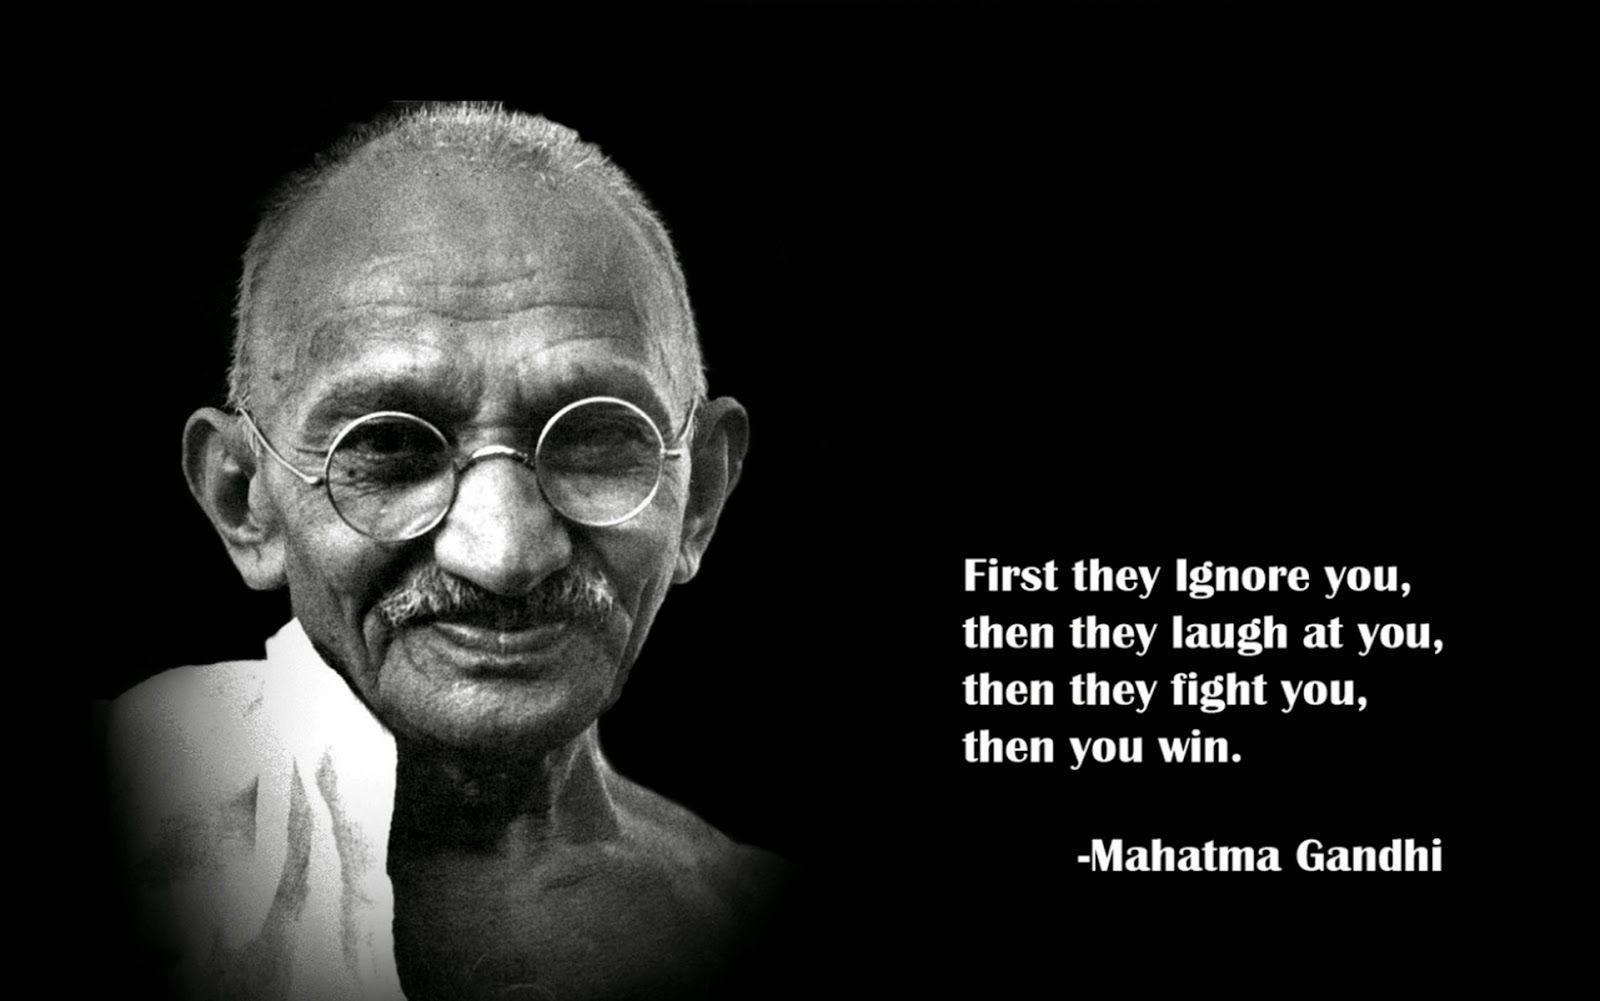 Махатма Гандхи: